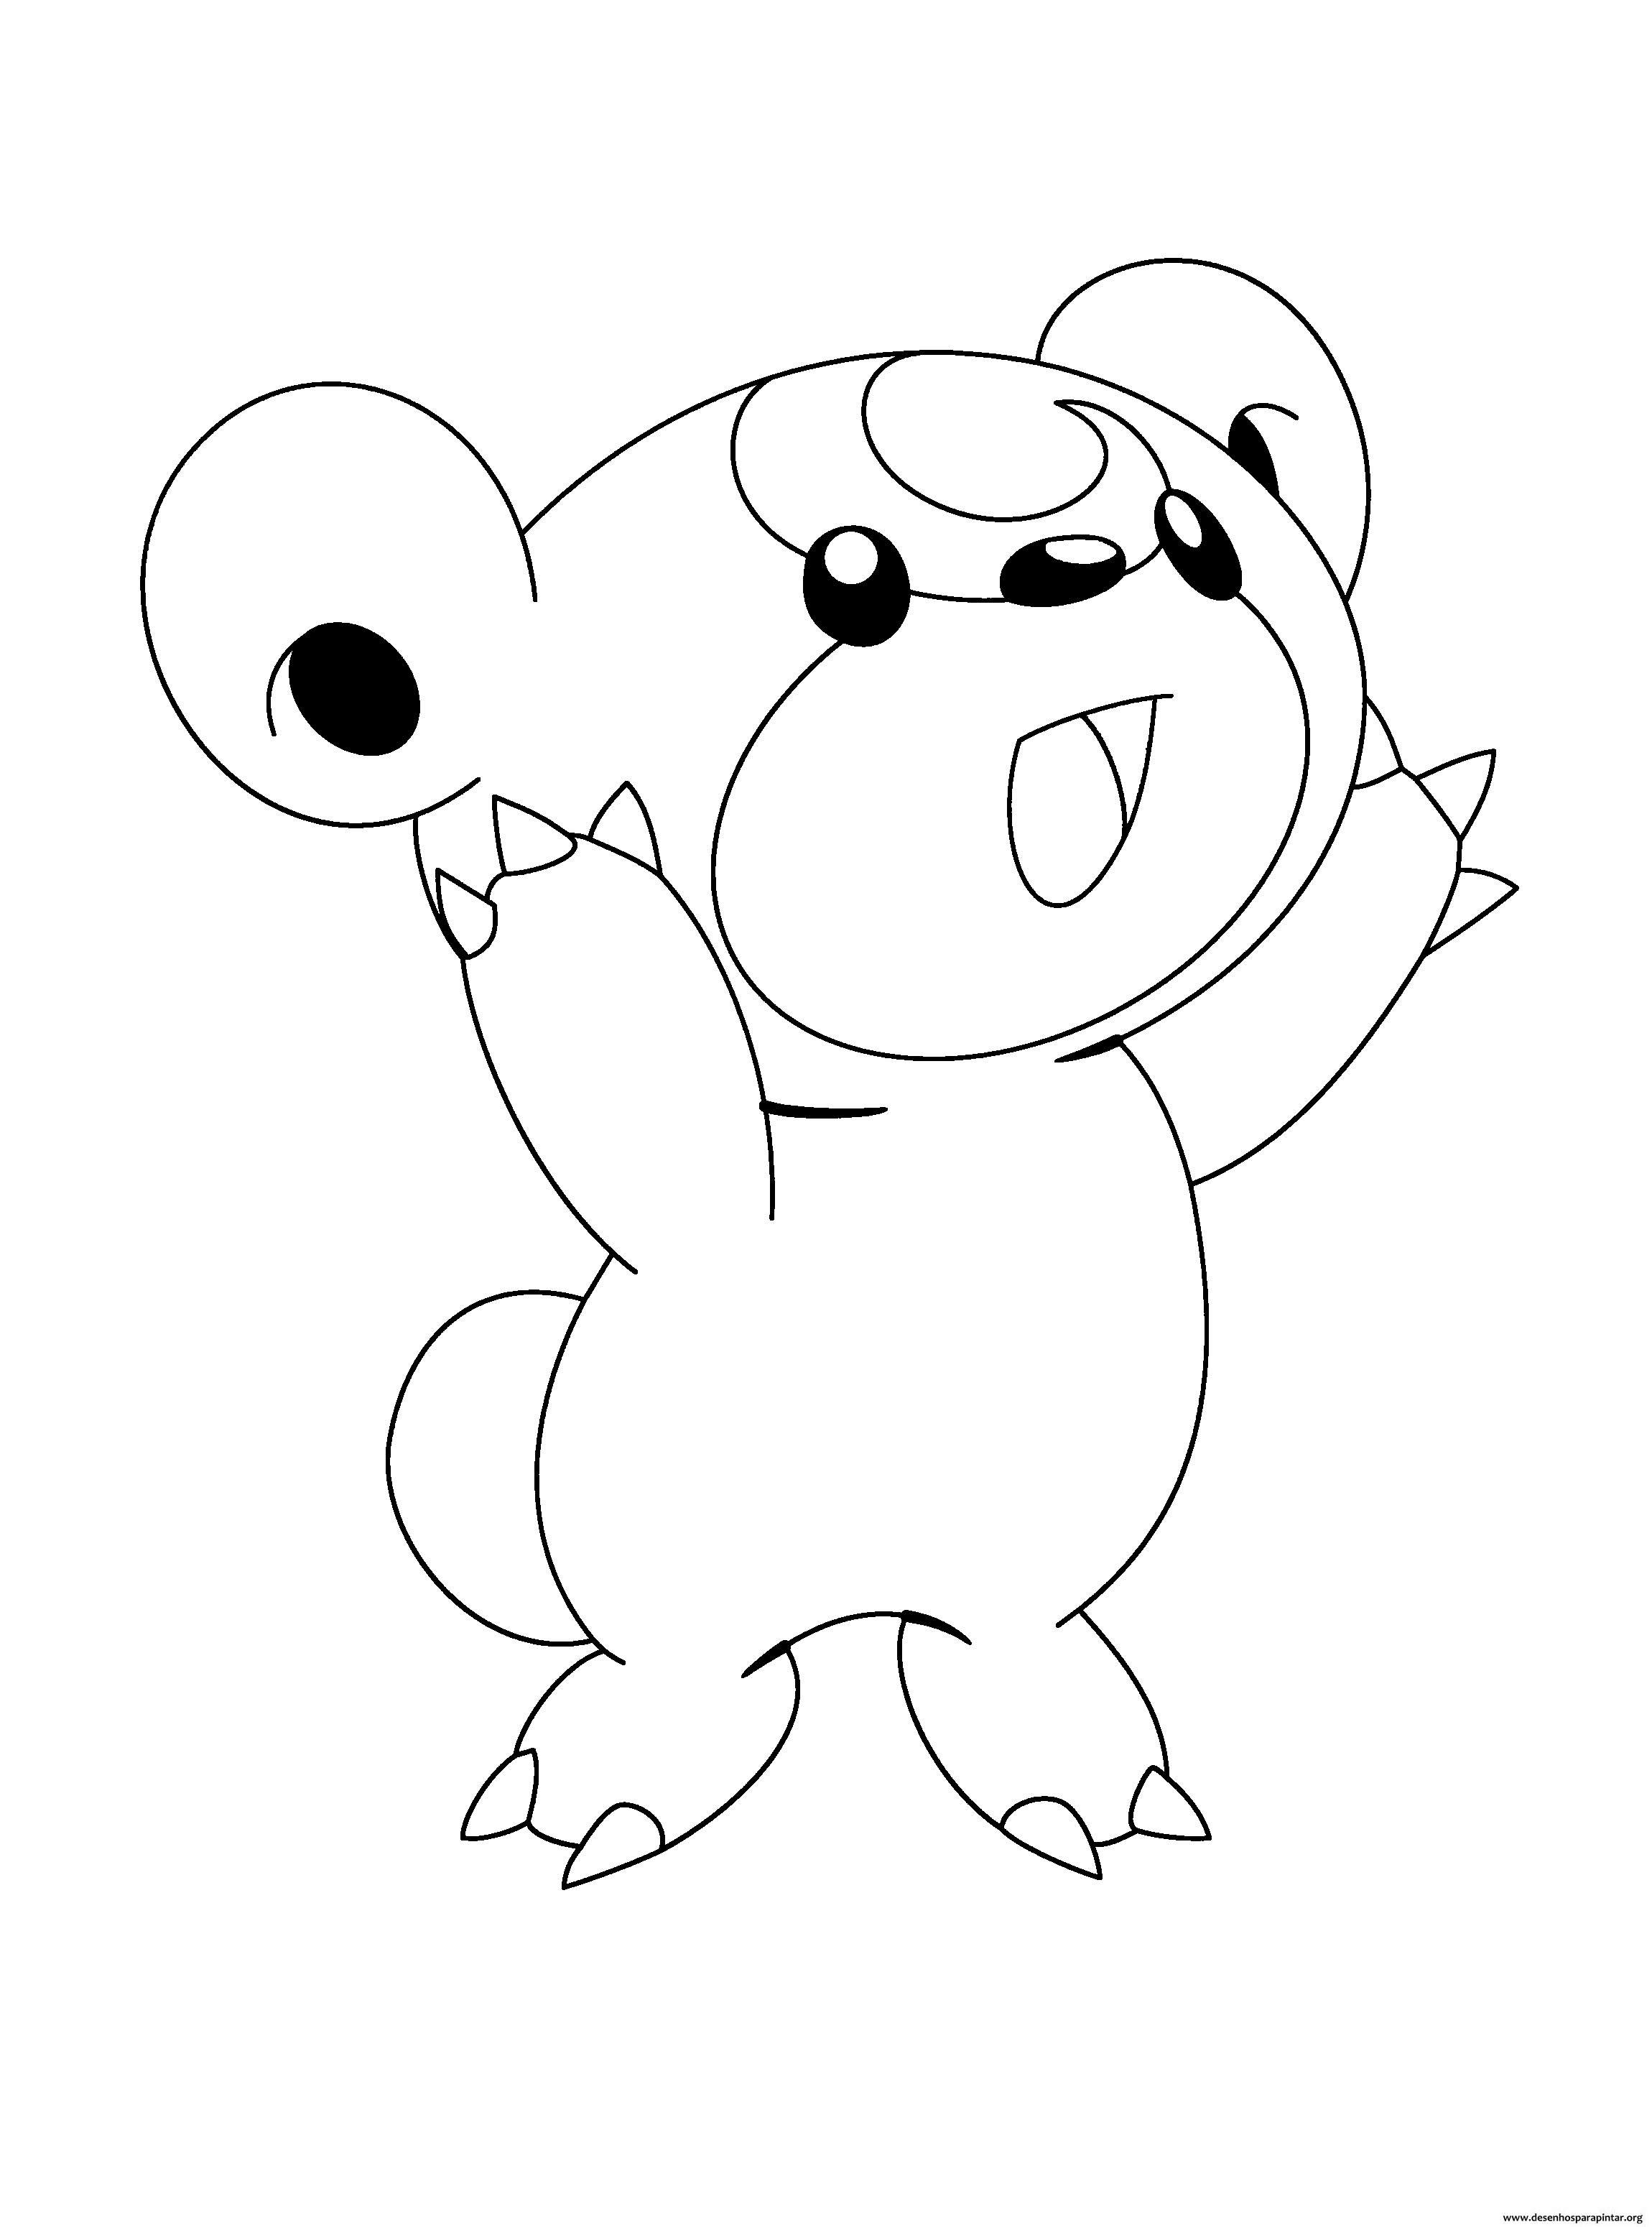 Desenhos Pokemon para imprimir, colorir e pintar